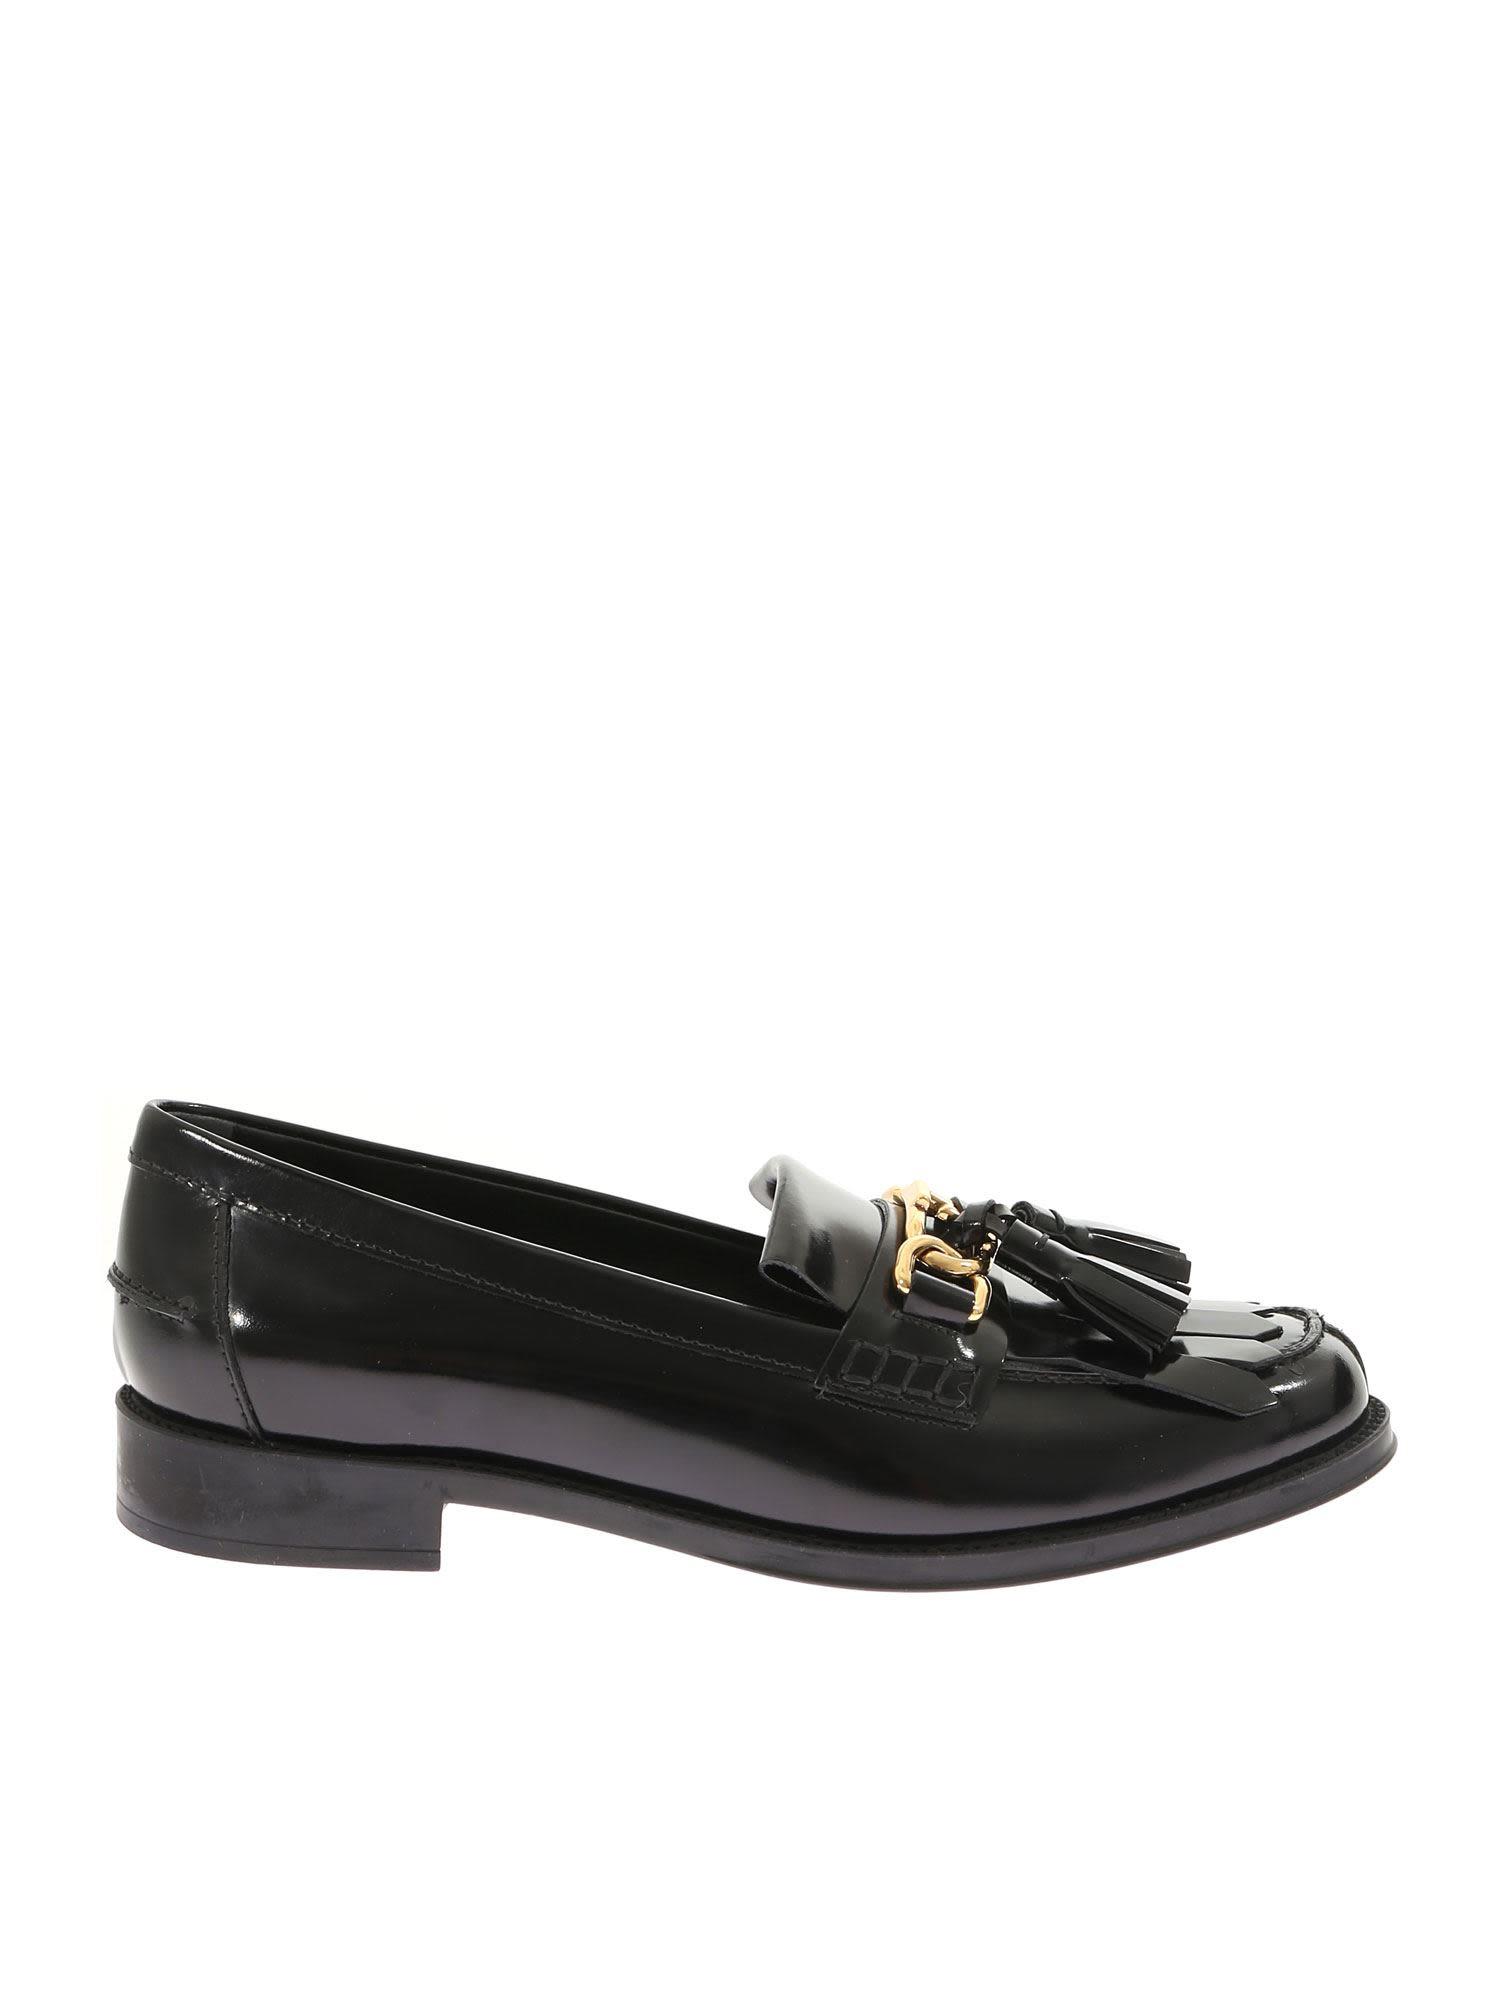 Tassel Detail Loafers, Black